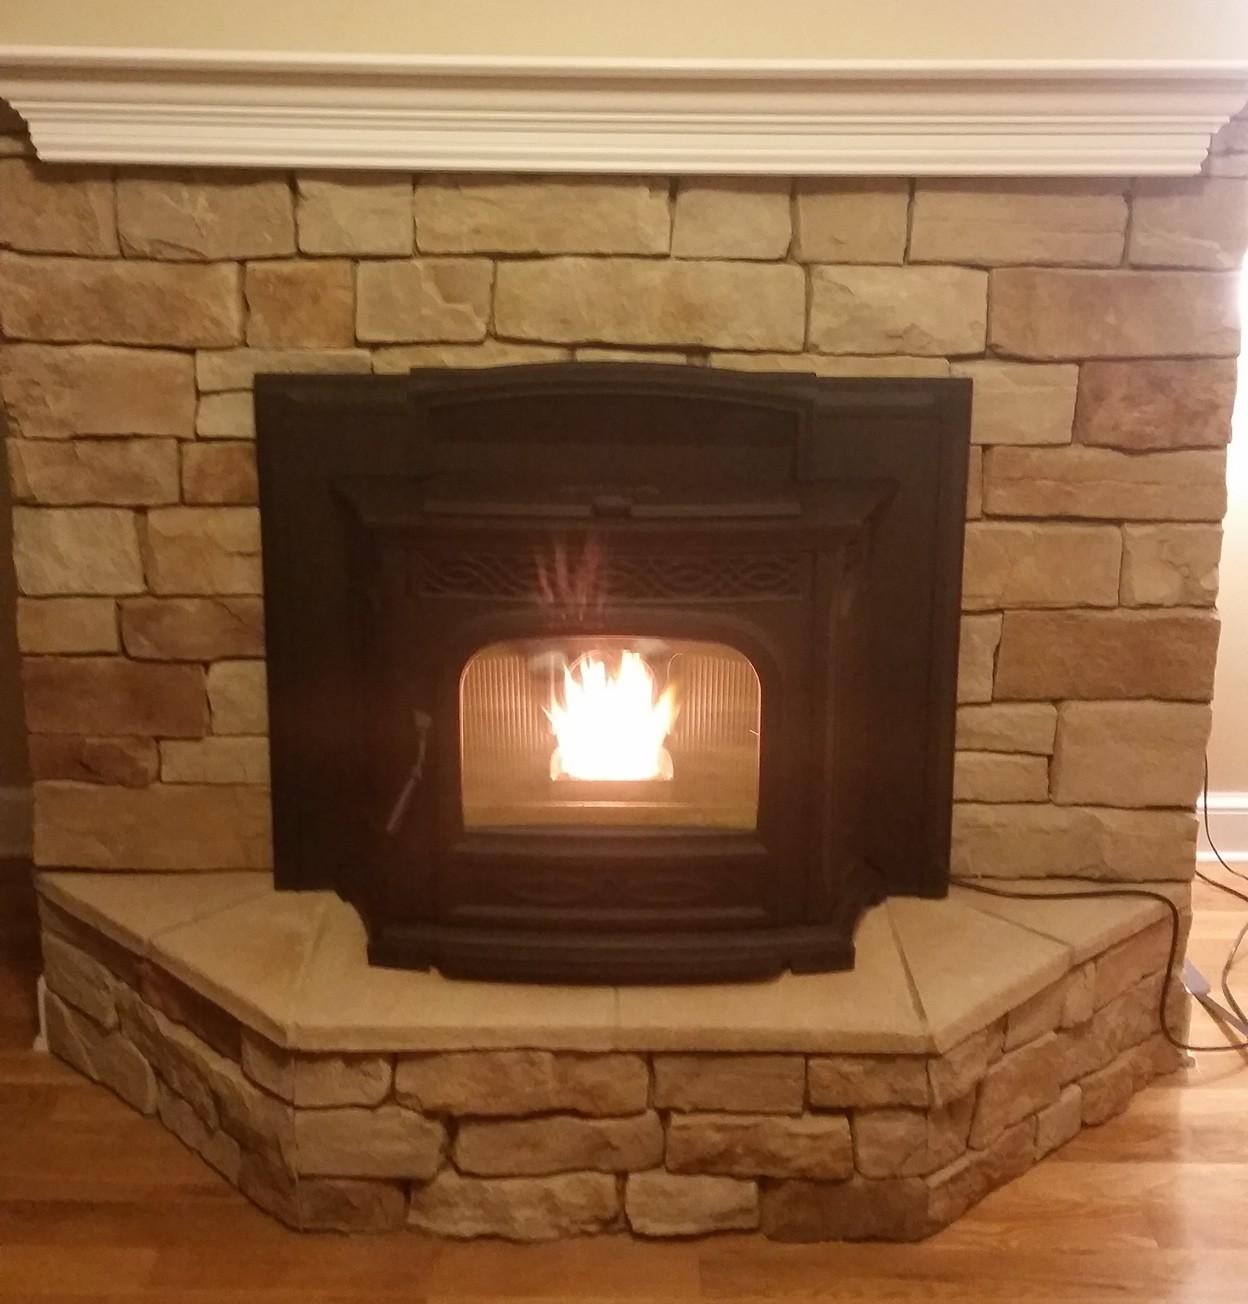 Epic-Building-Company-Dublin-Ohio-Gas-Fireplace